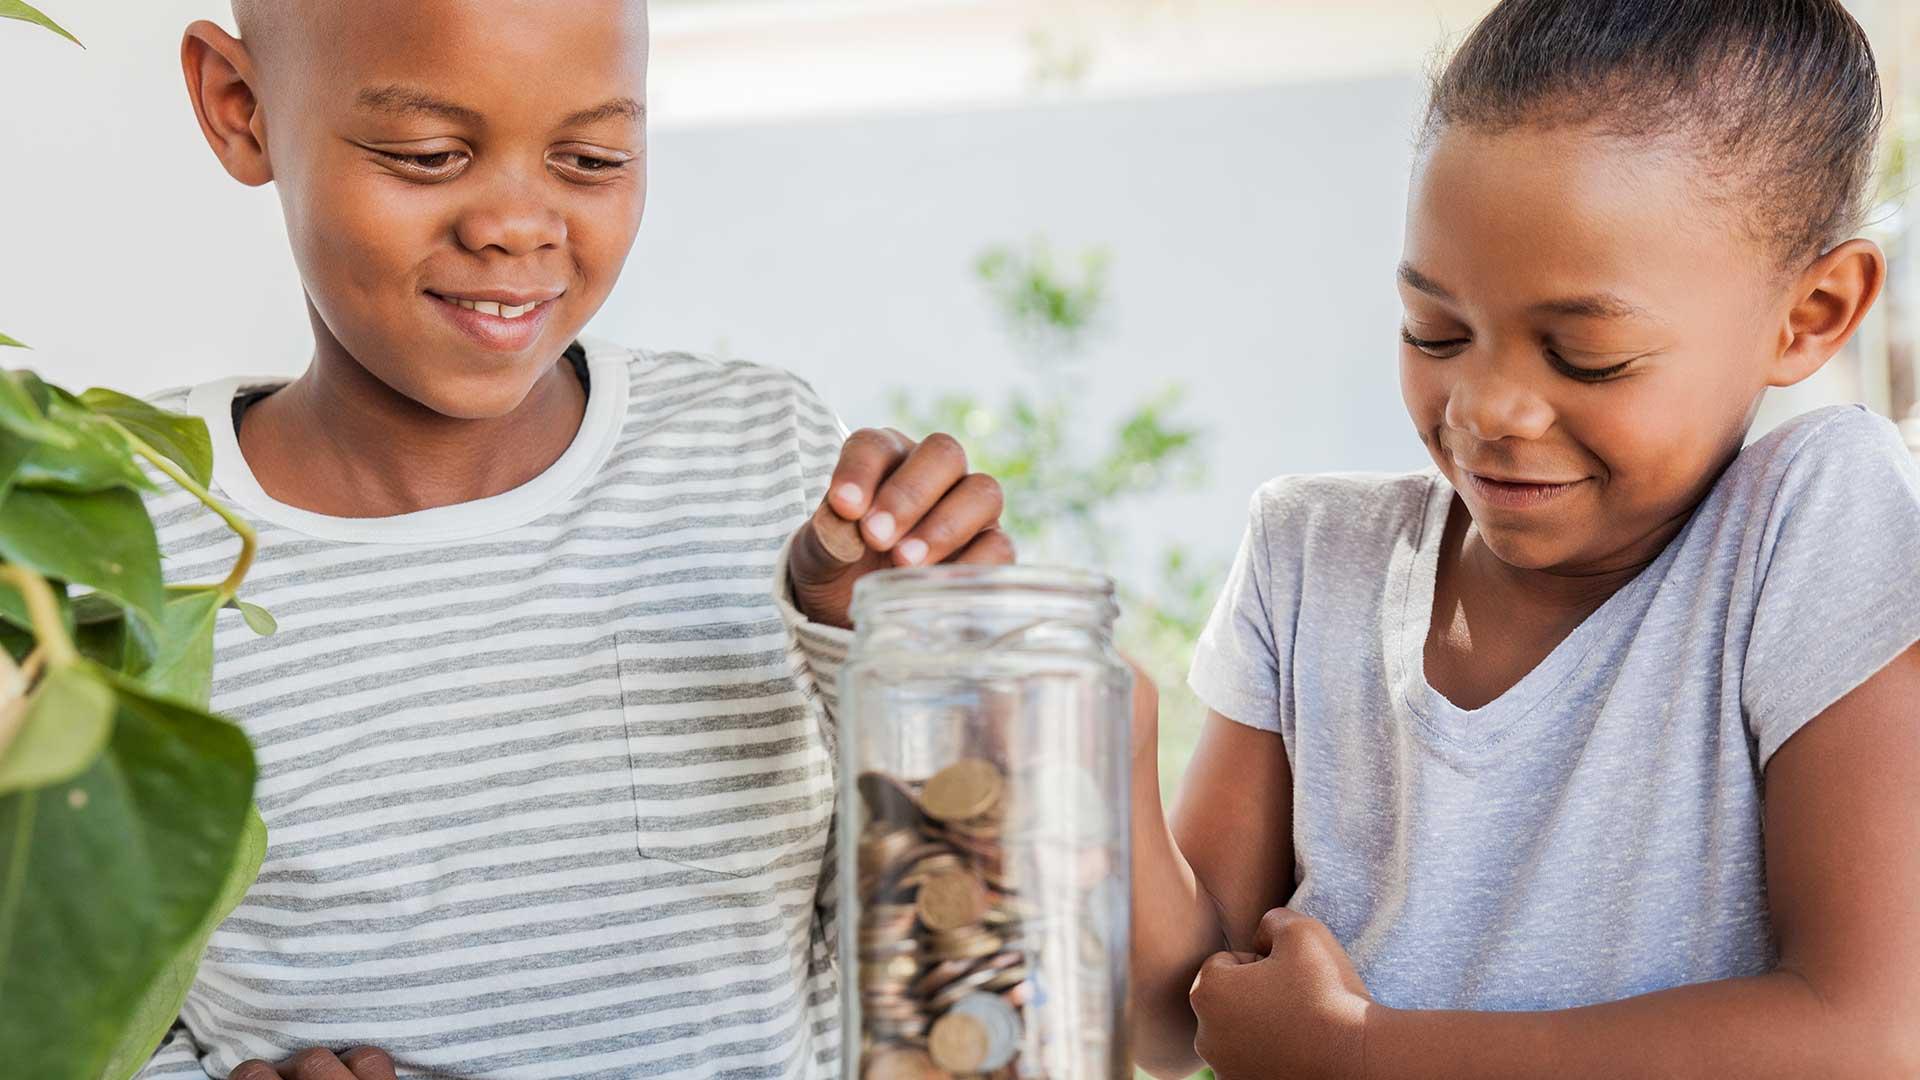 Teaching kids how to save